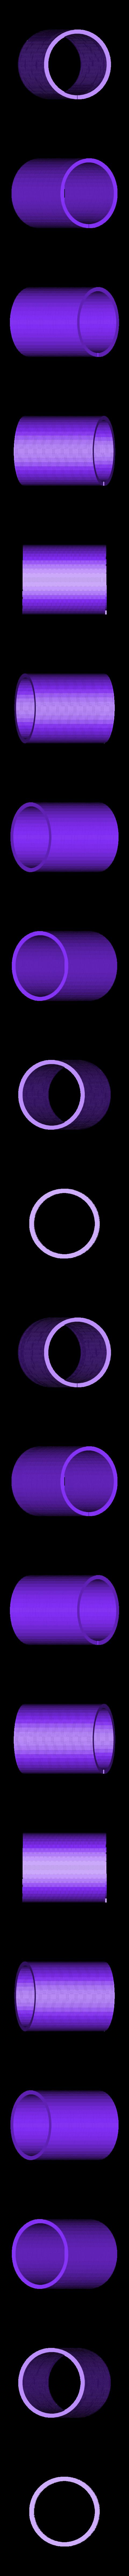 LargeCircleSlinky.stl Download free STL file Slinkies • Template to 3D print, Ristrorg